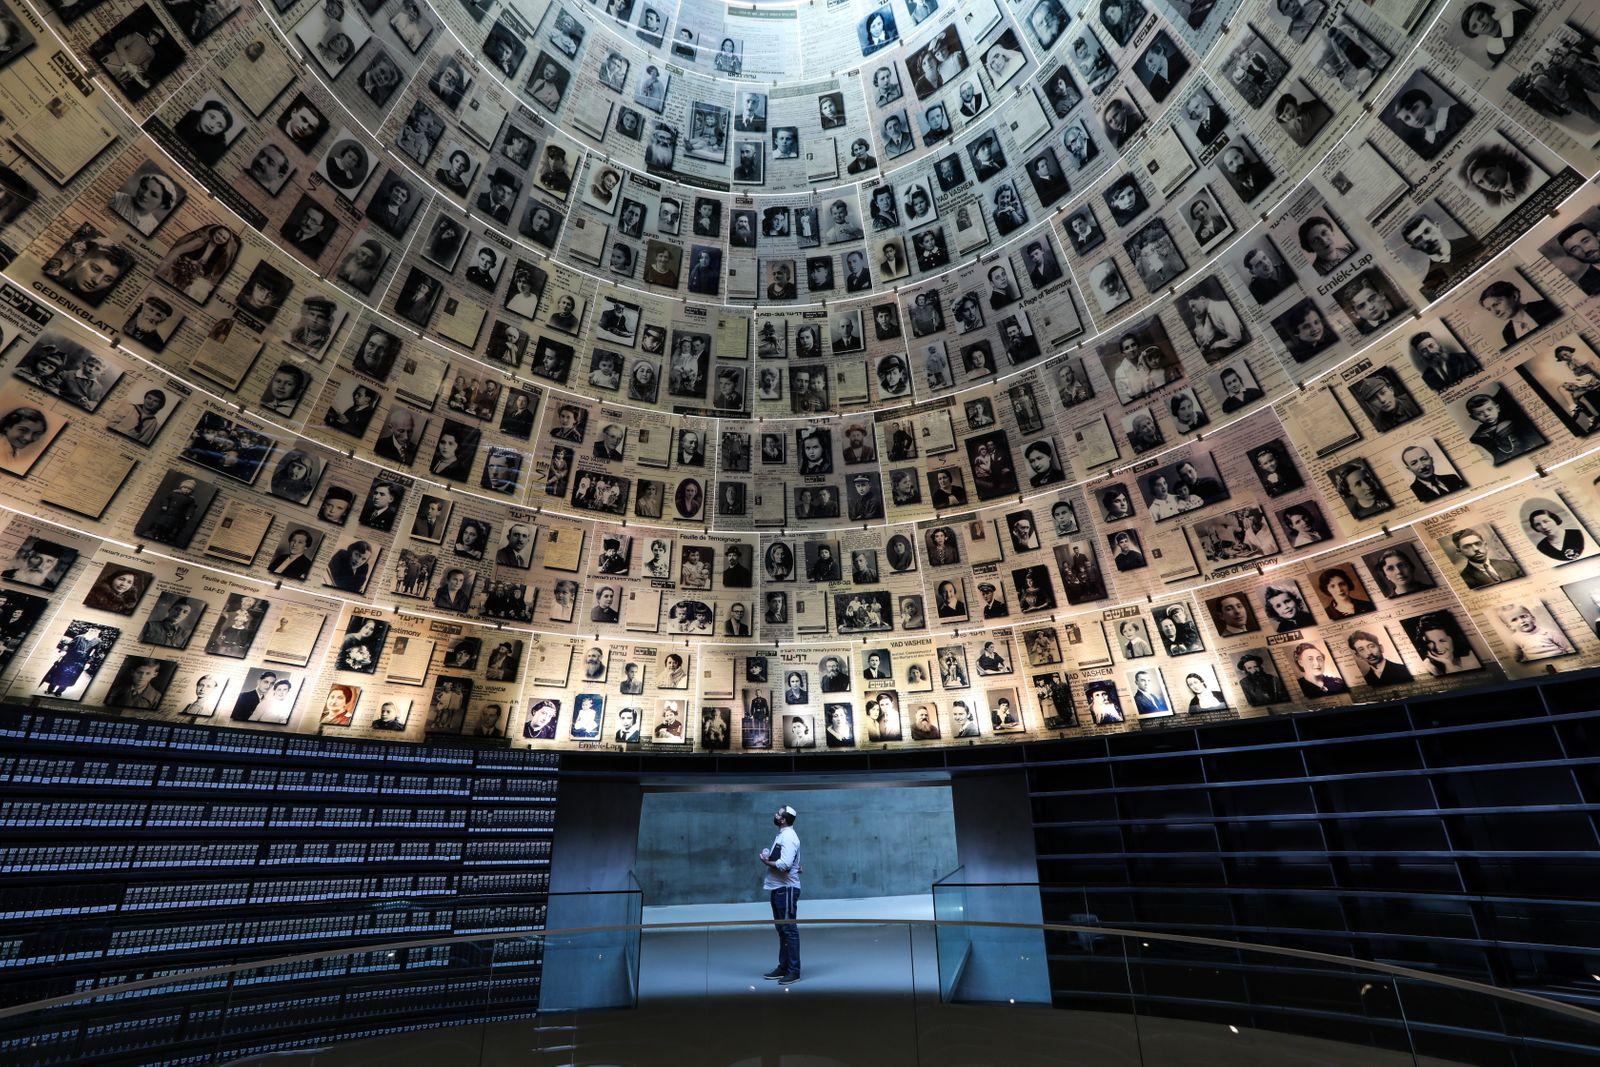 Yad Vashem Holocaust Memorial museum in Jerusalem